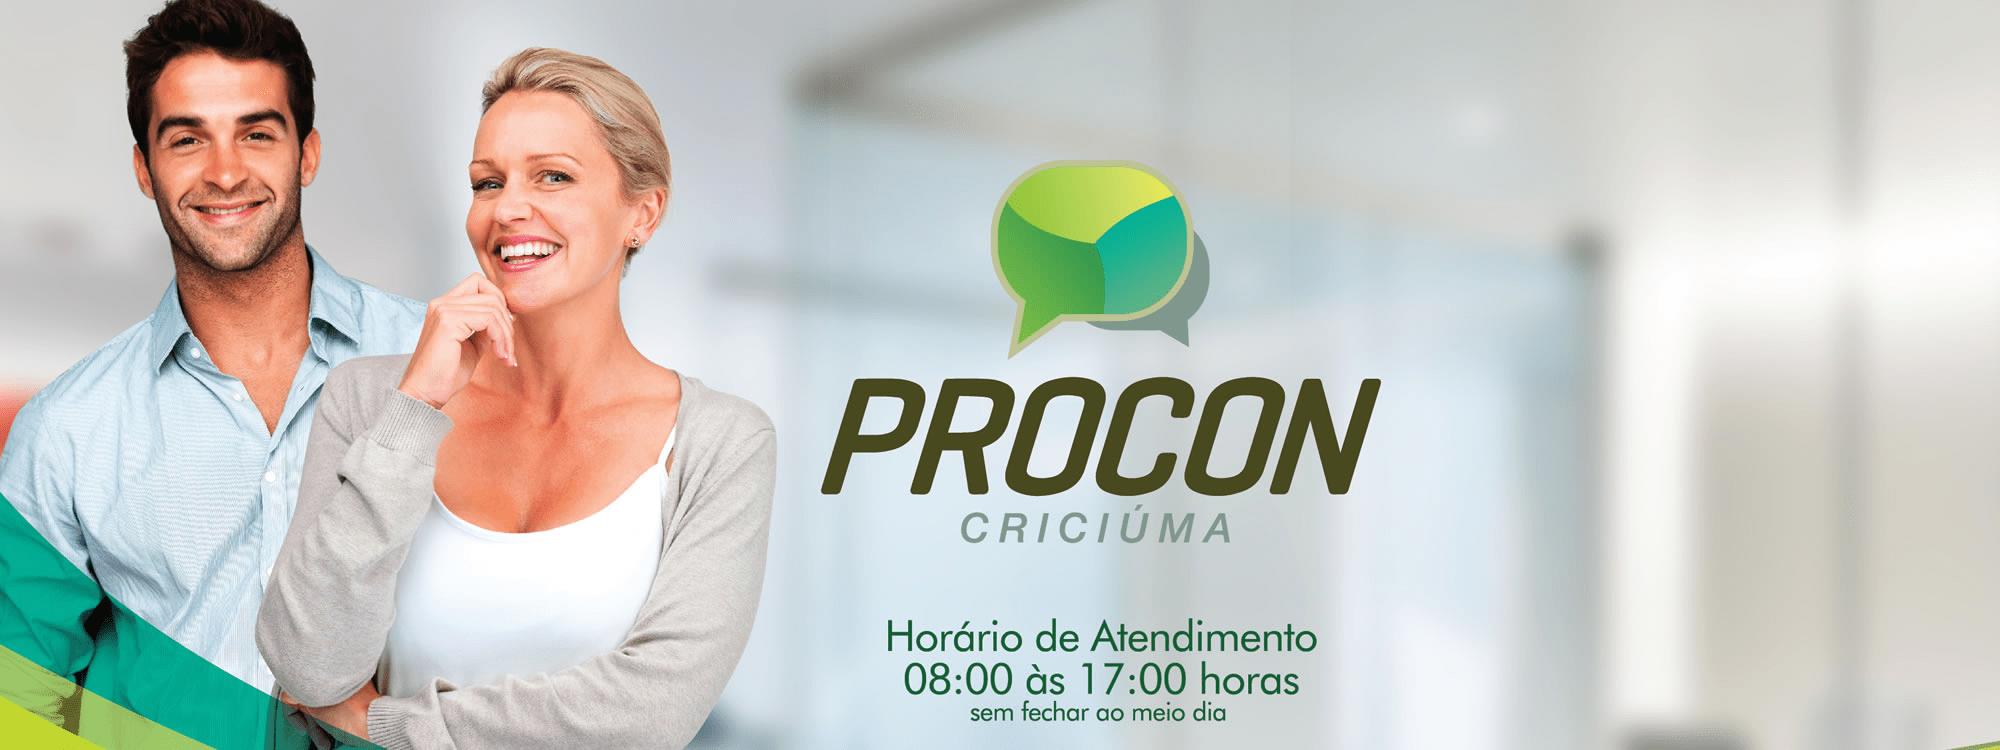 Procon Criciúma